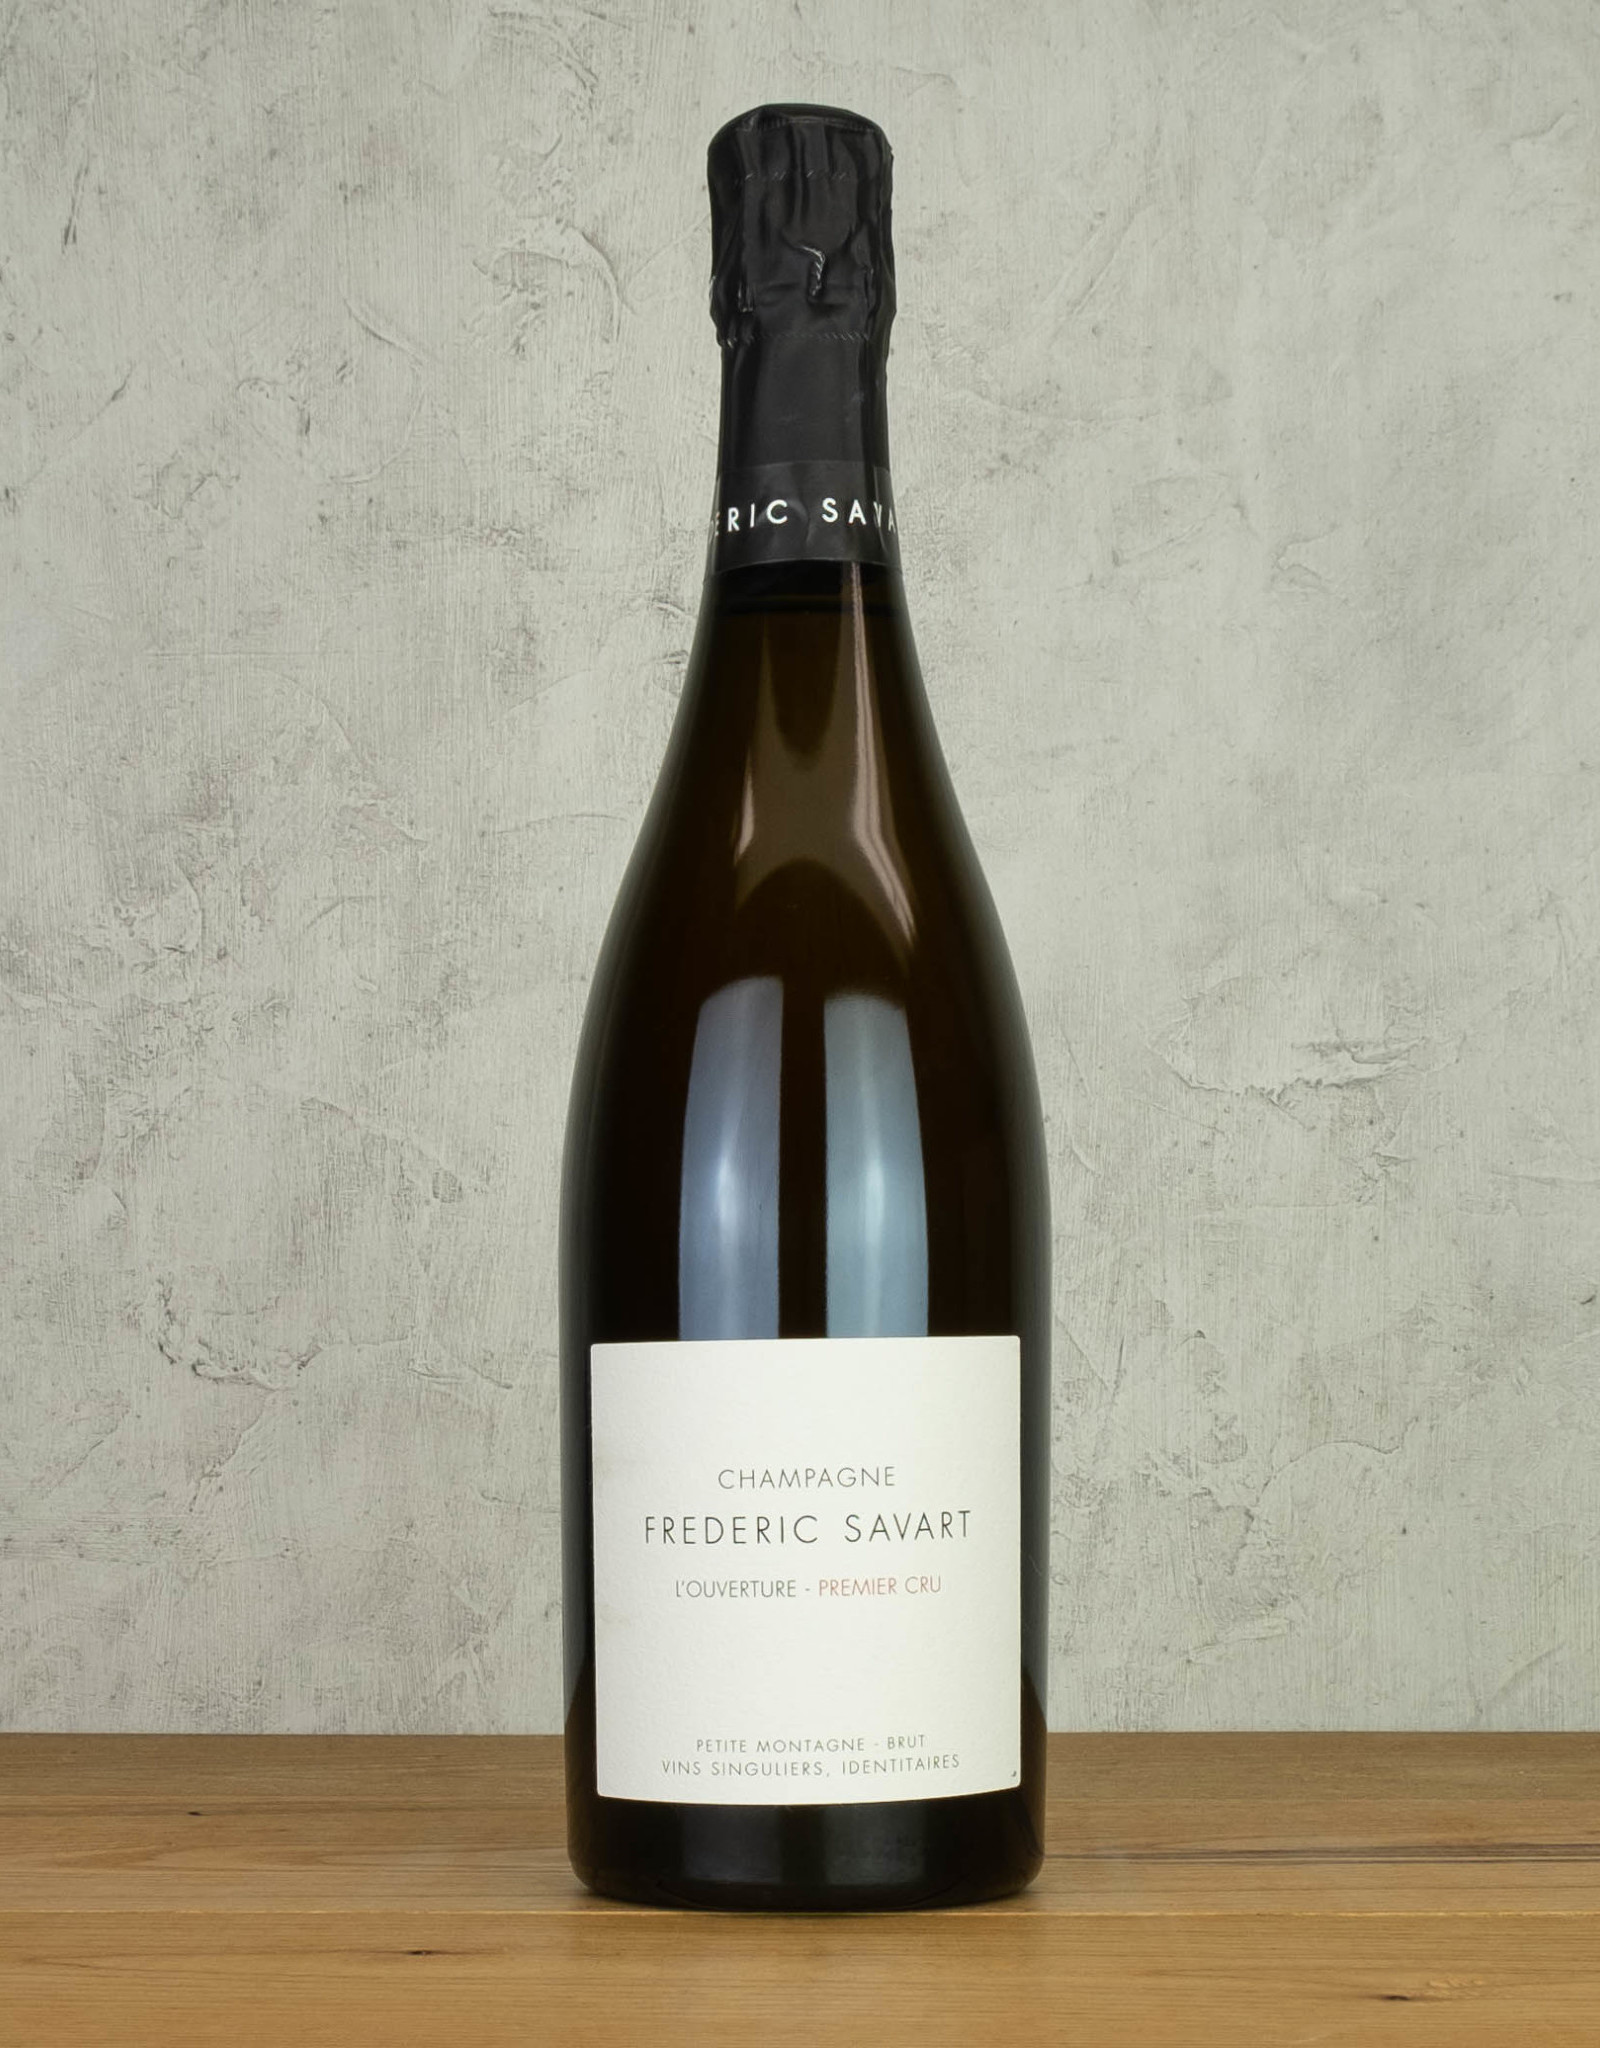 Champagne Frederic Savart L'Ouverture